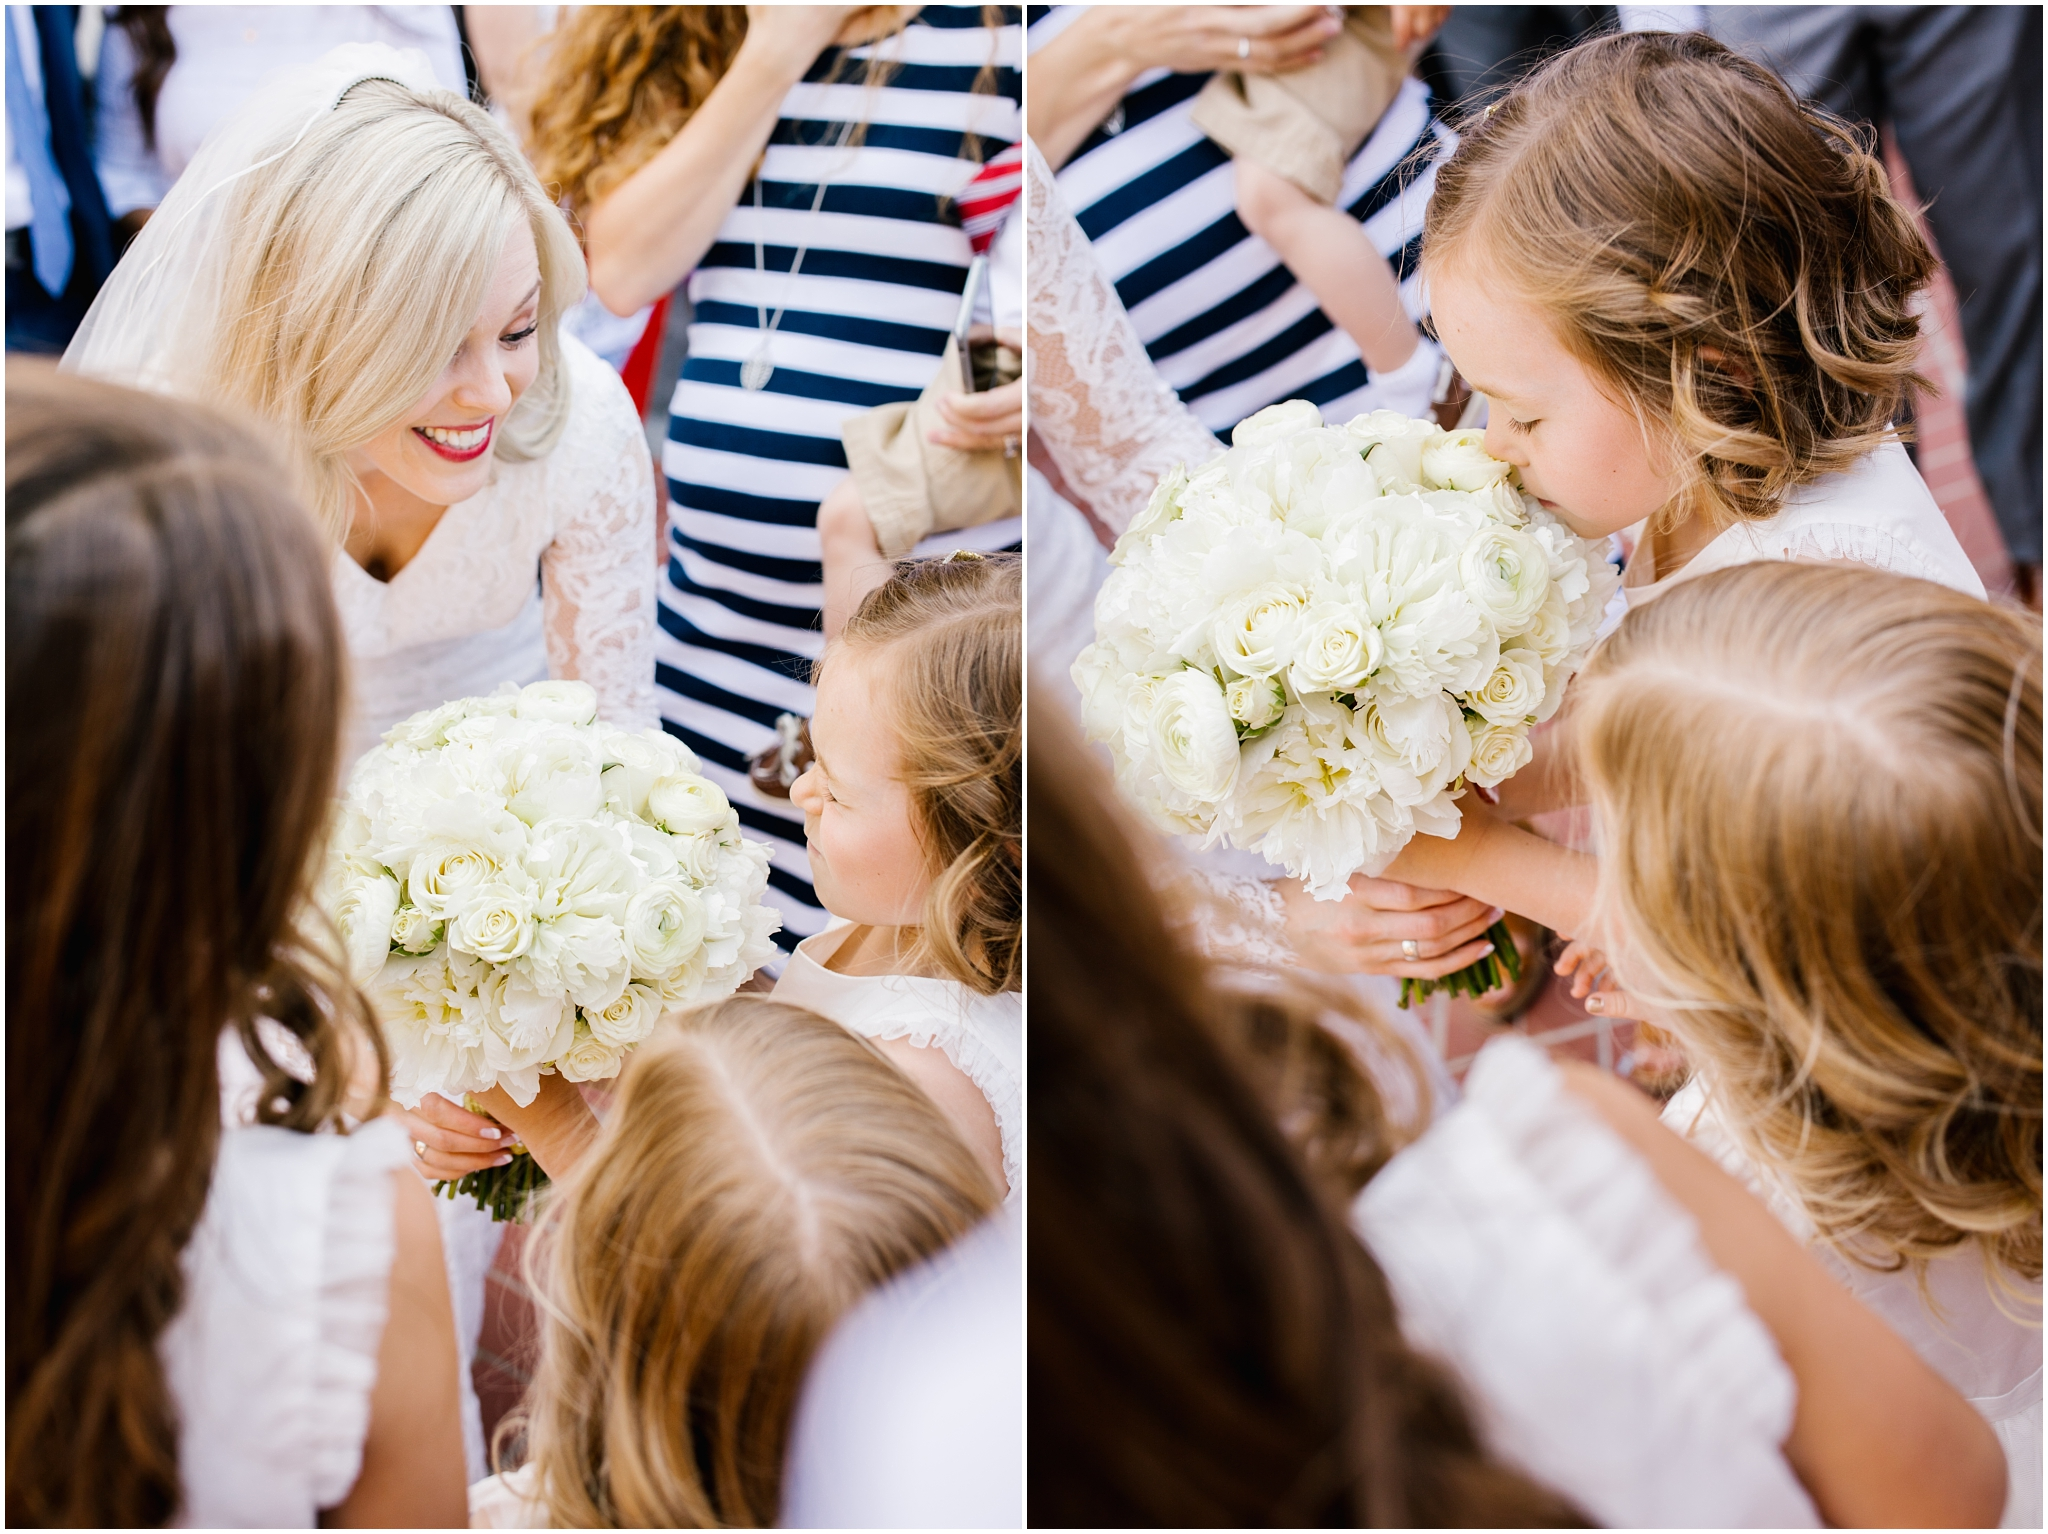 CherylandTyler-21_Lizzie-B-Imagery-Utah-Wedding-Photographer-Salt-Lake-City-Temple-Wells-Fargo-Building-Reception.jpg